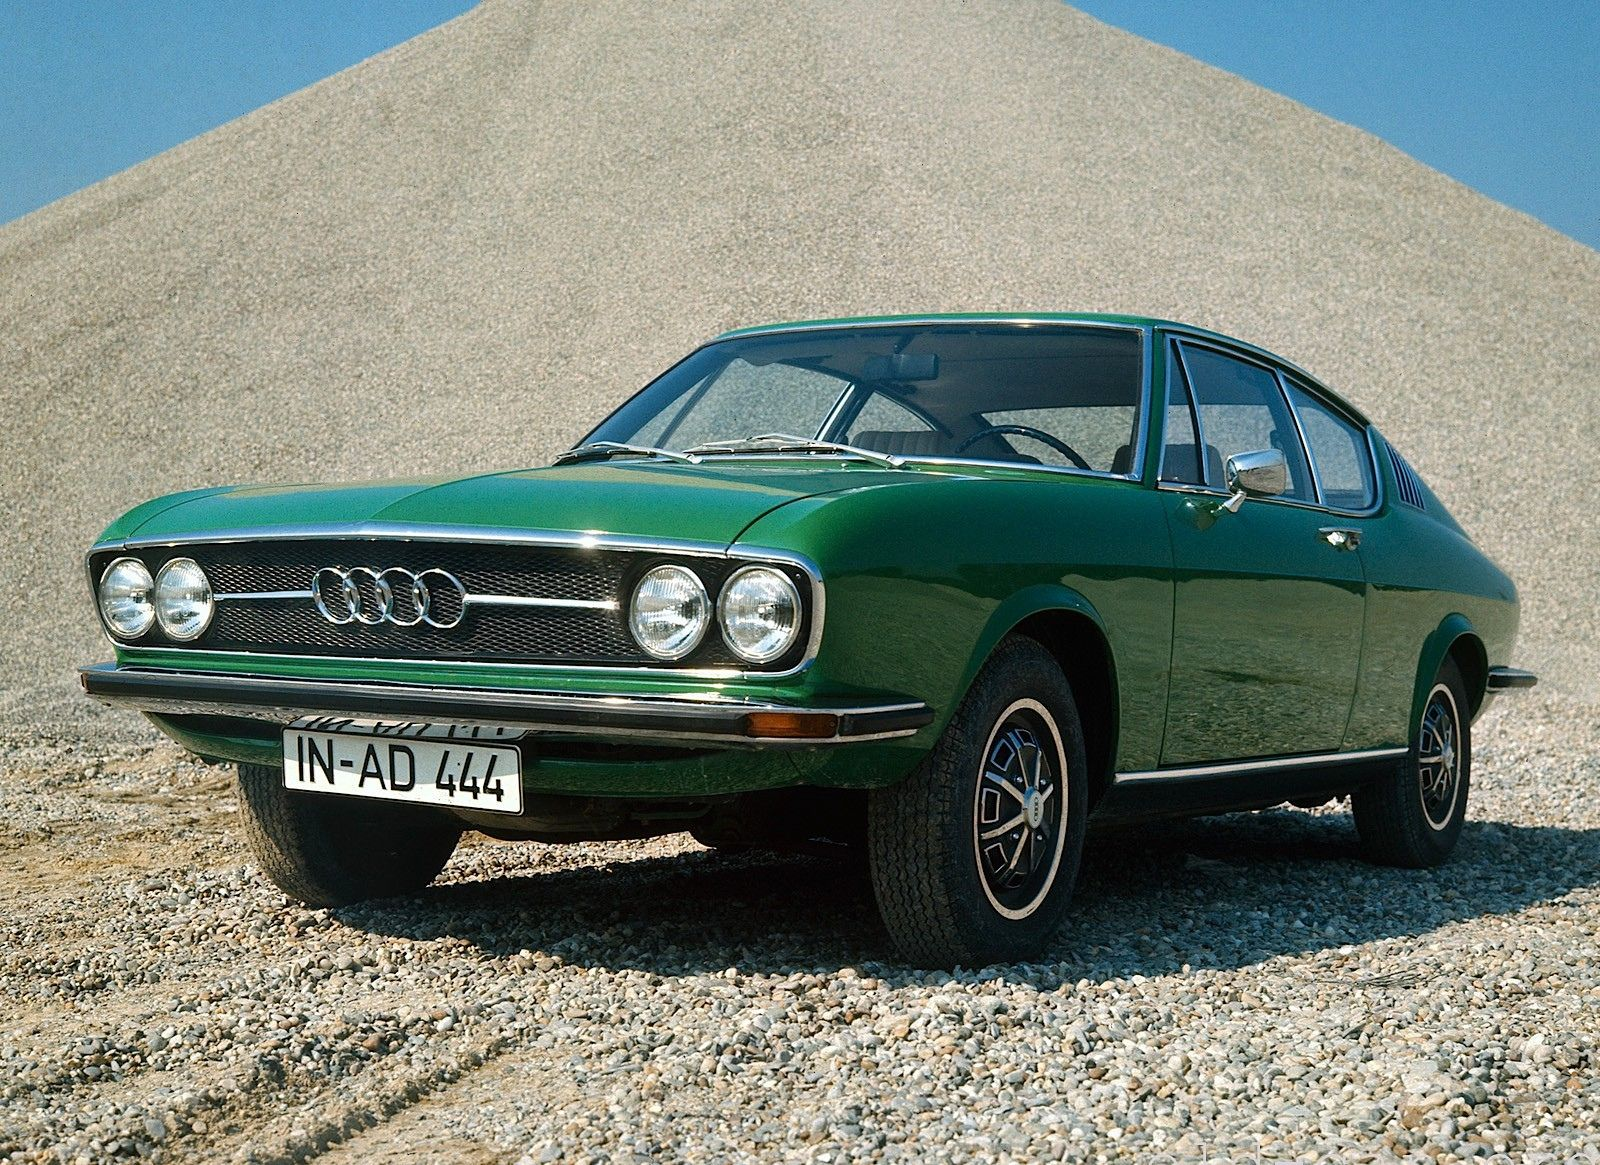 Vintage Audi Coupe | Audi Style | Pinterest | Audi 100, Audi coupe ...